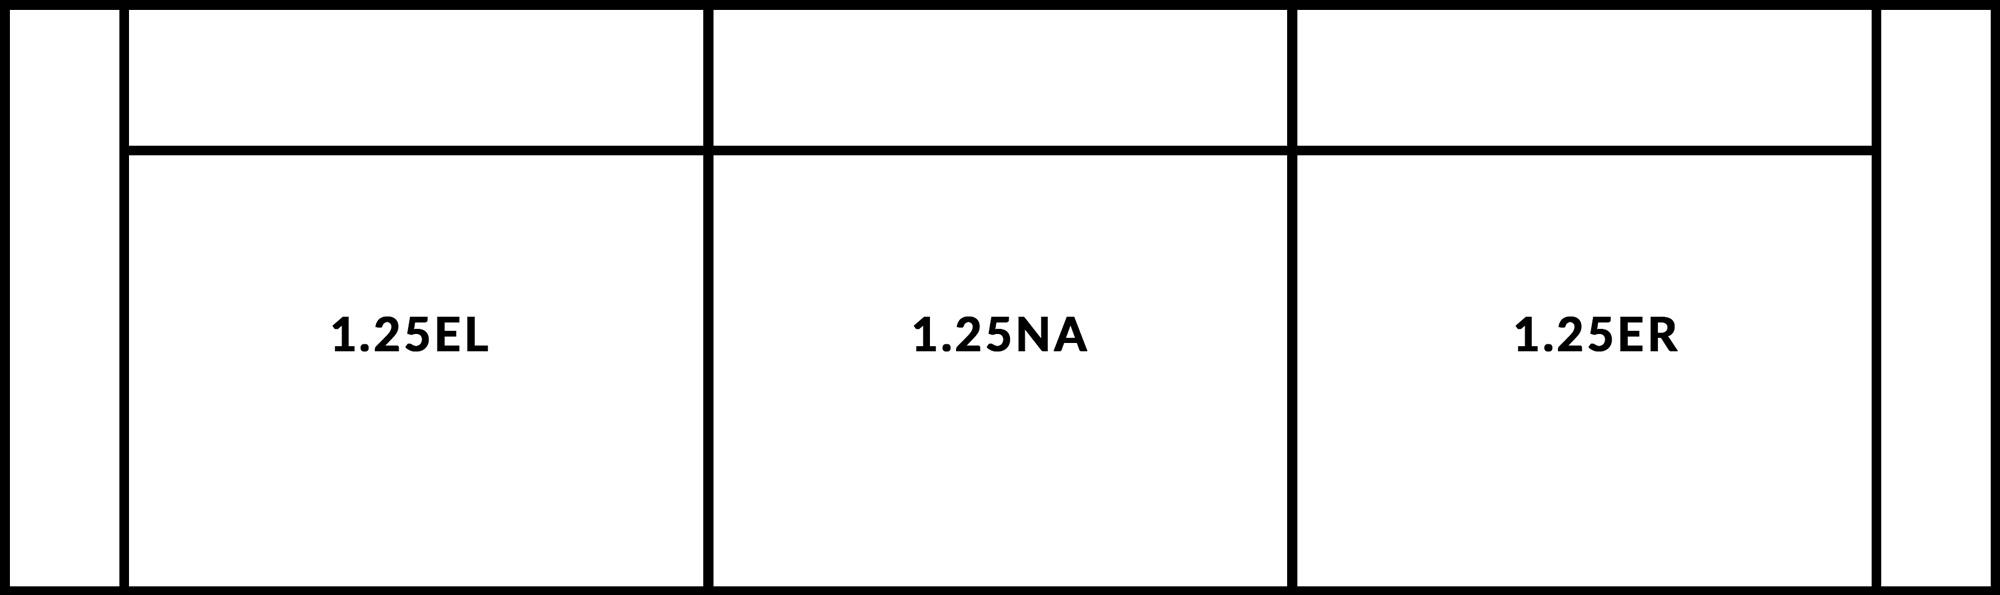 FrontRow™ Tegra 3 seat straight option 2